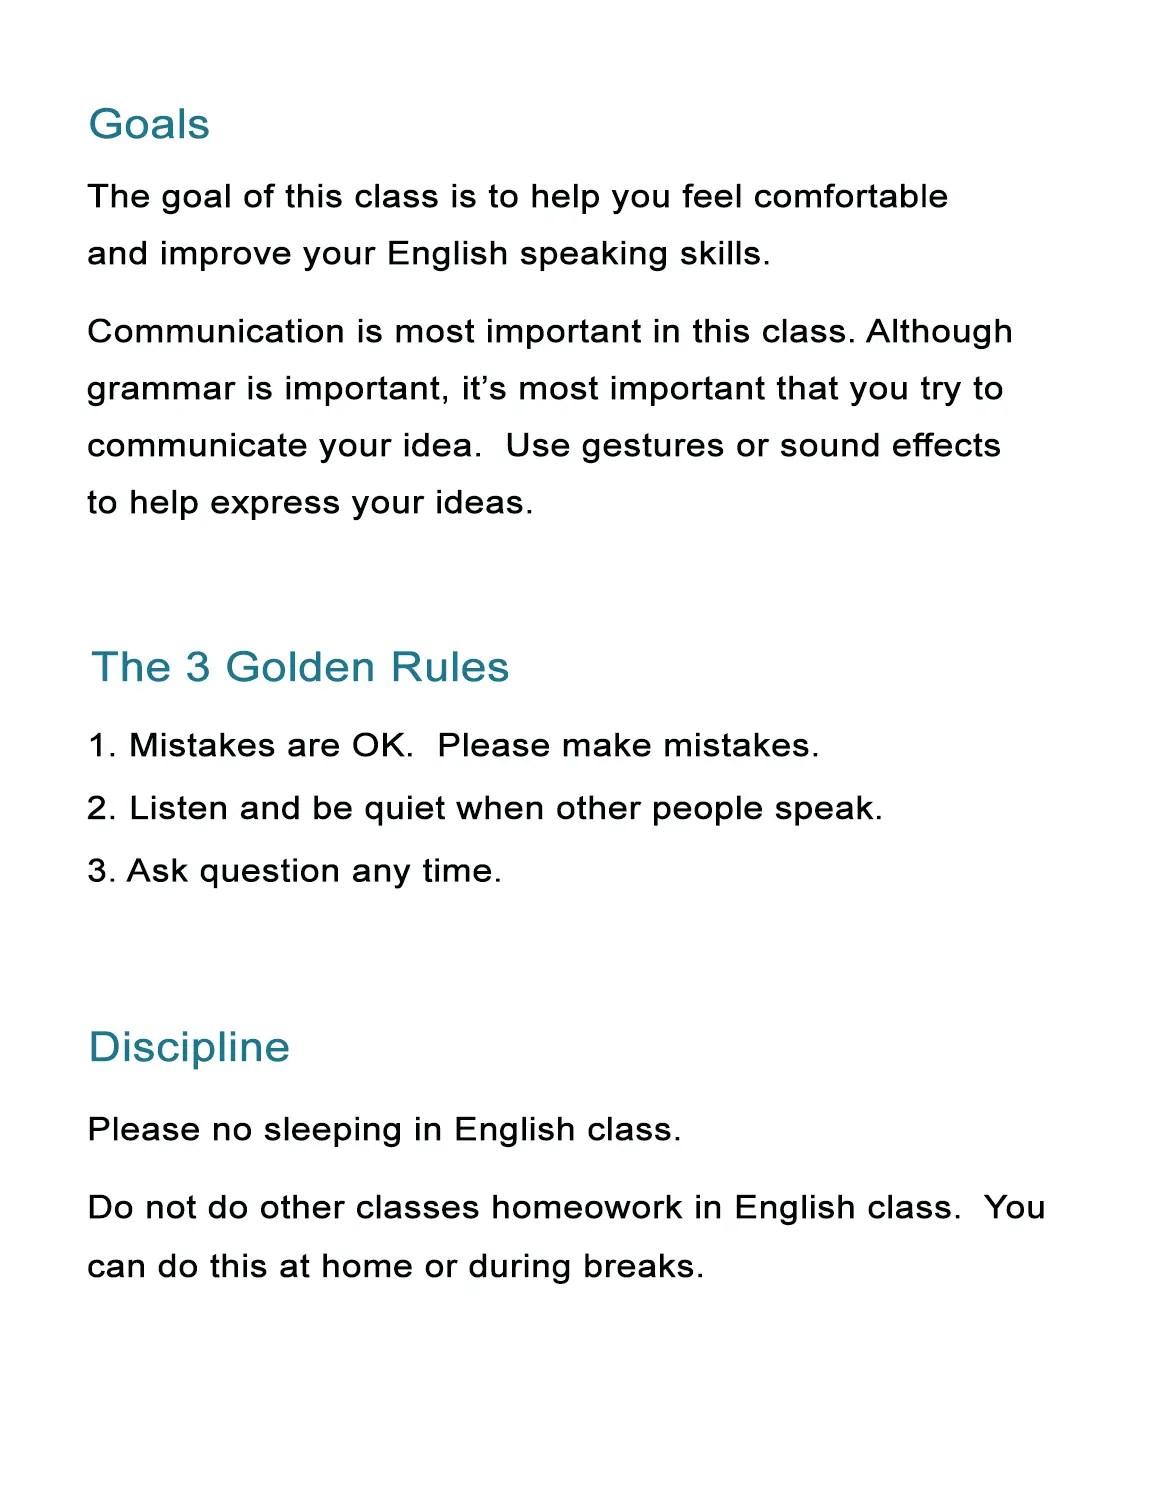 13 Free Esl Lesson Plans To Master Your Esl Classes